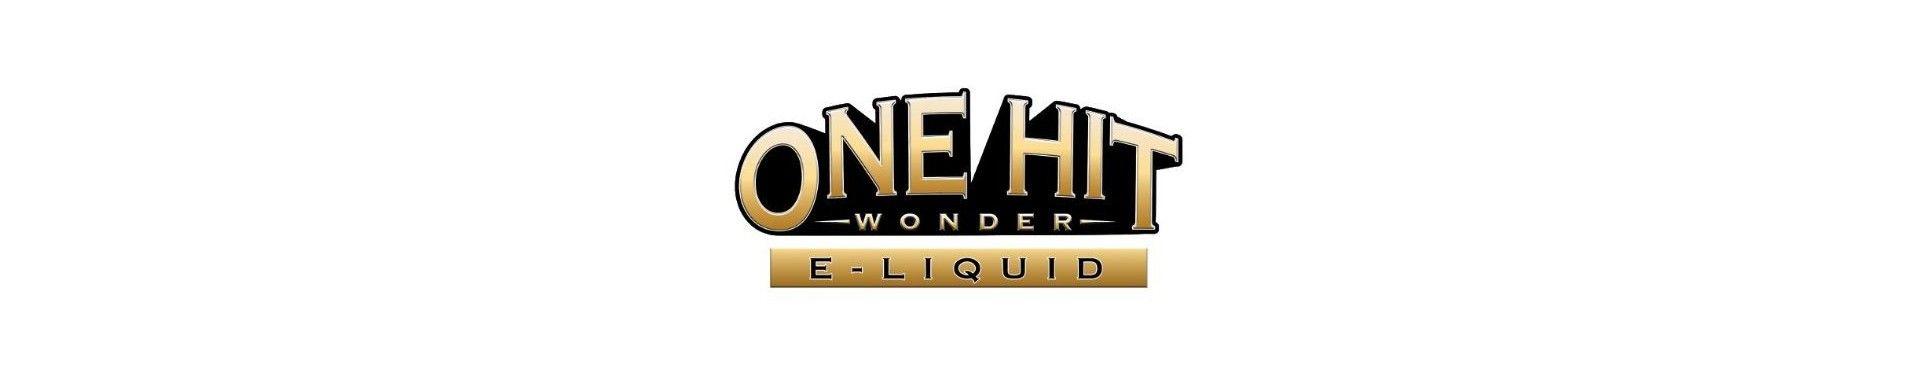 One Hit Wonder (Aroma)